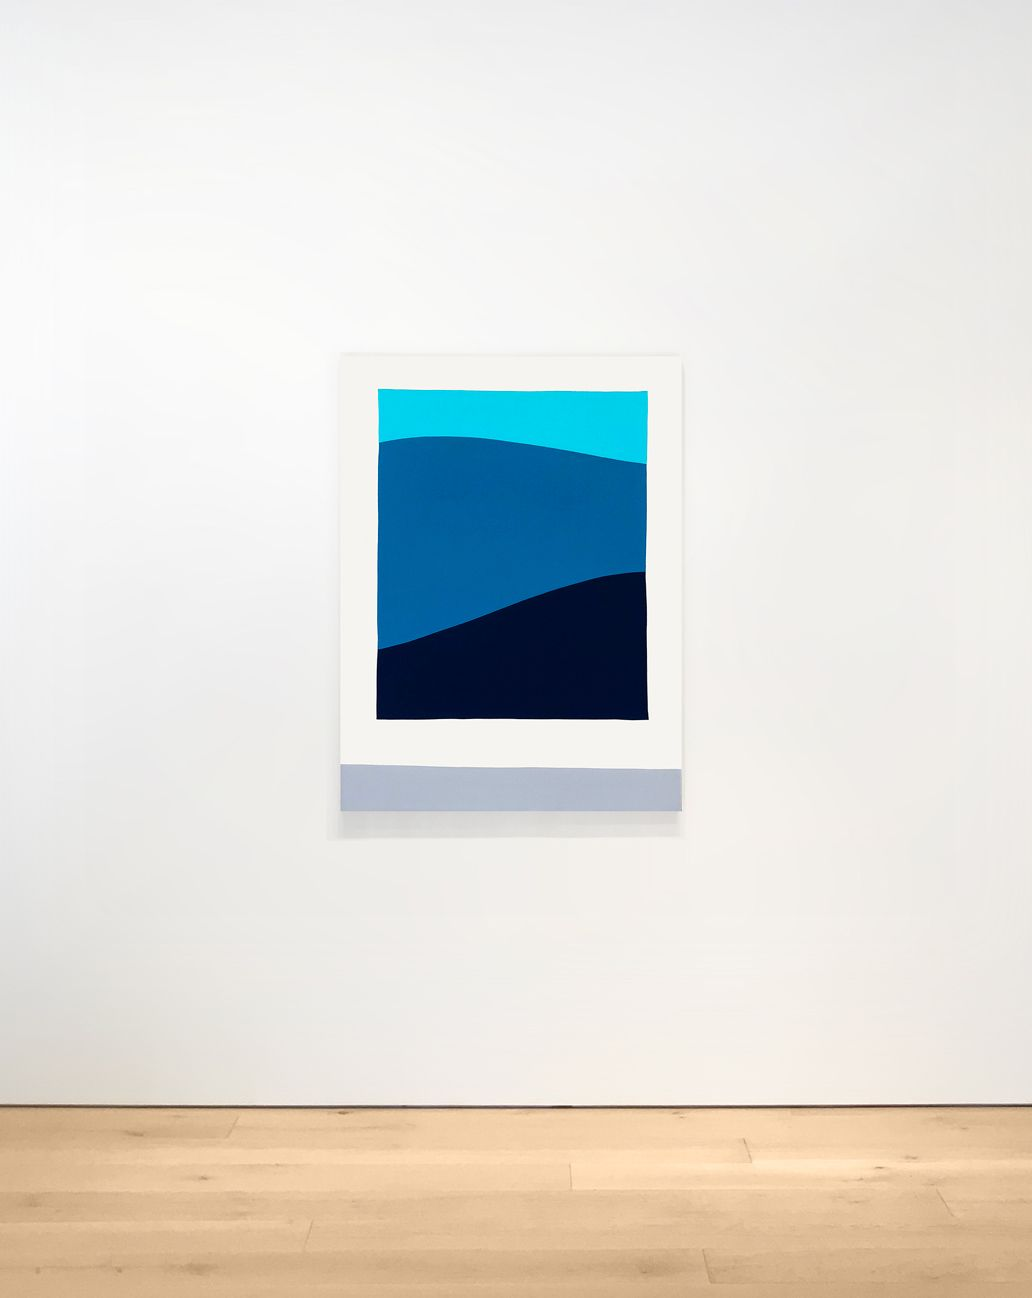 Paul Kremer Window 05 (Slope), 2018